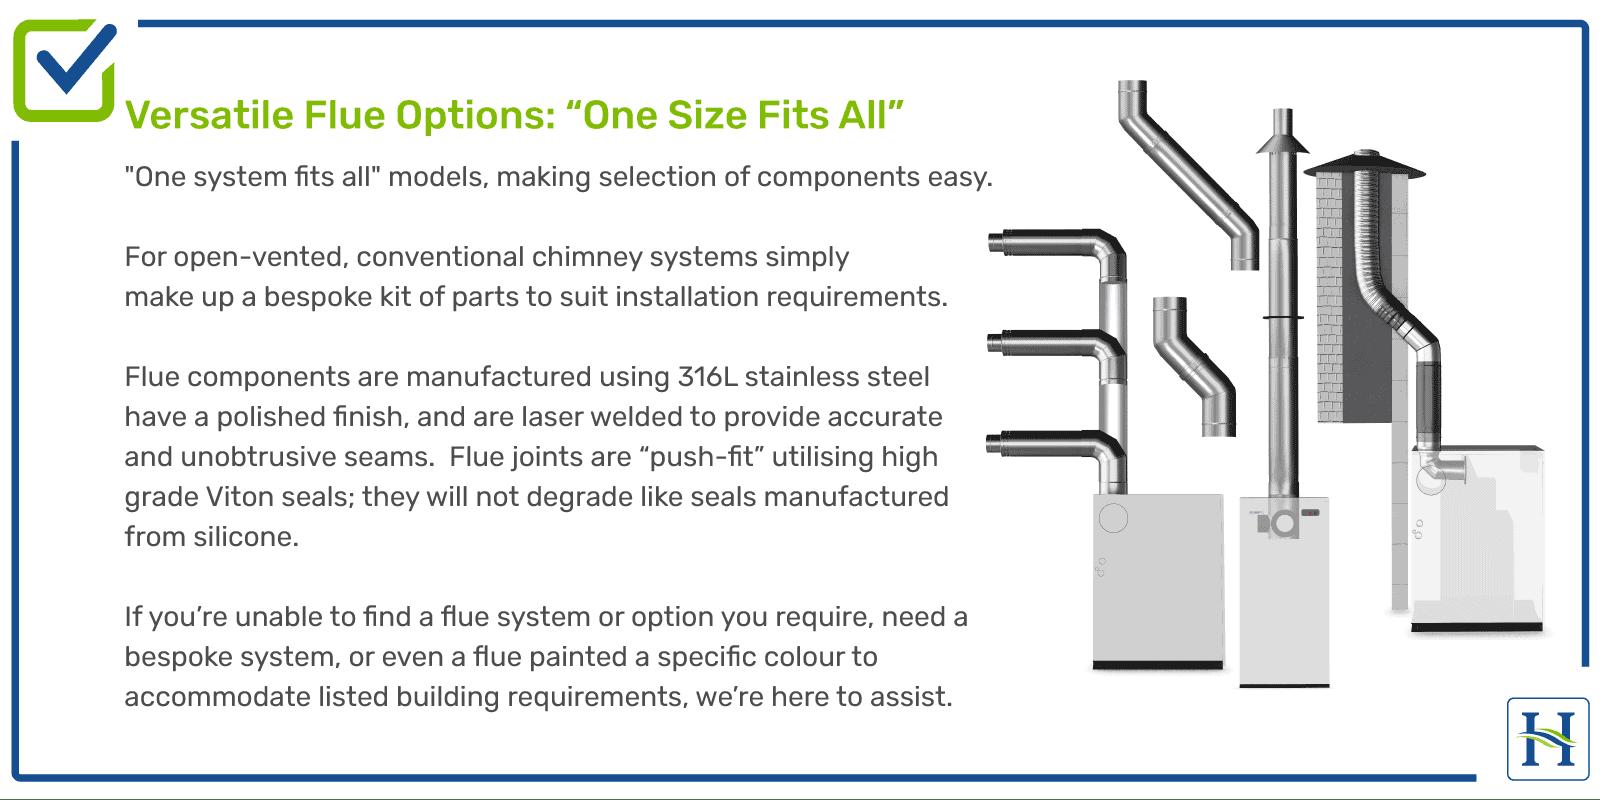 Versatile Flue Options for boilers